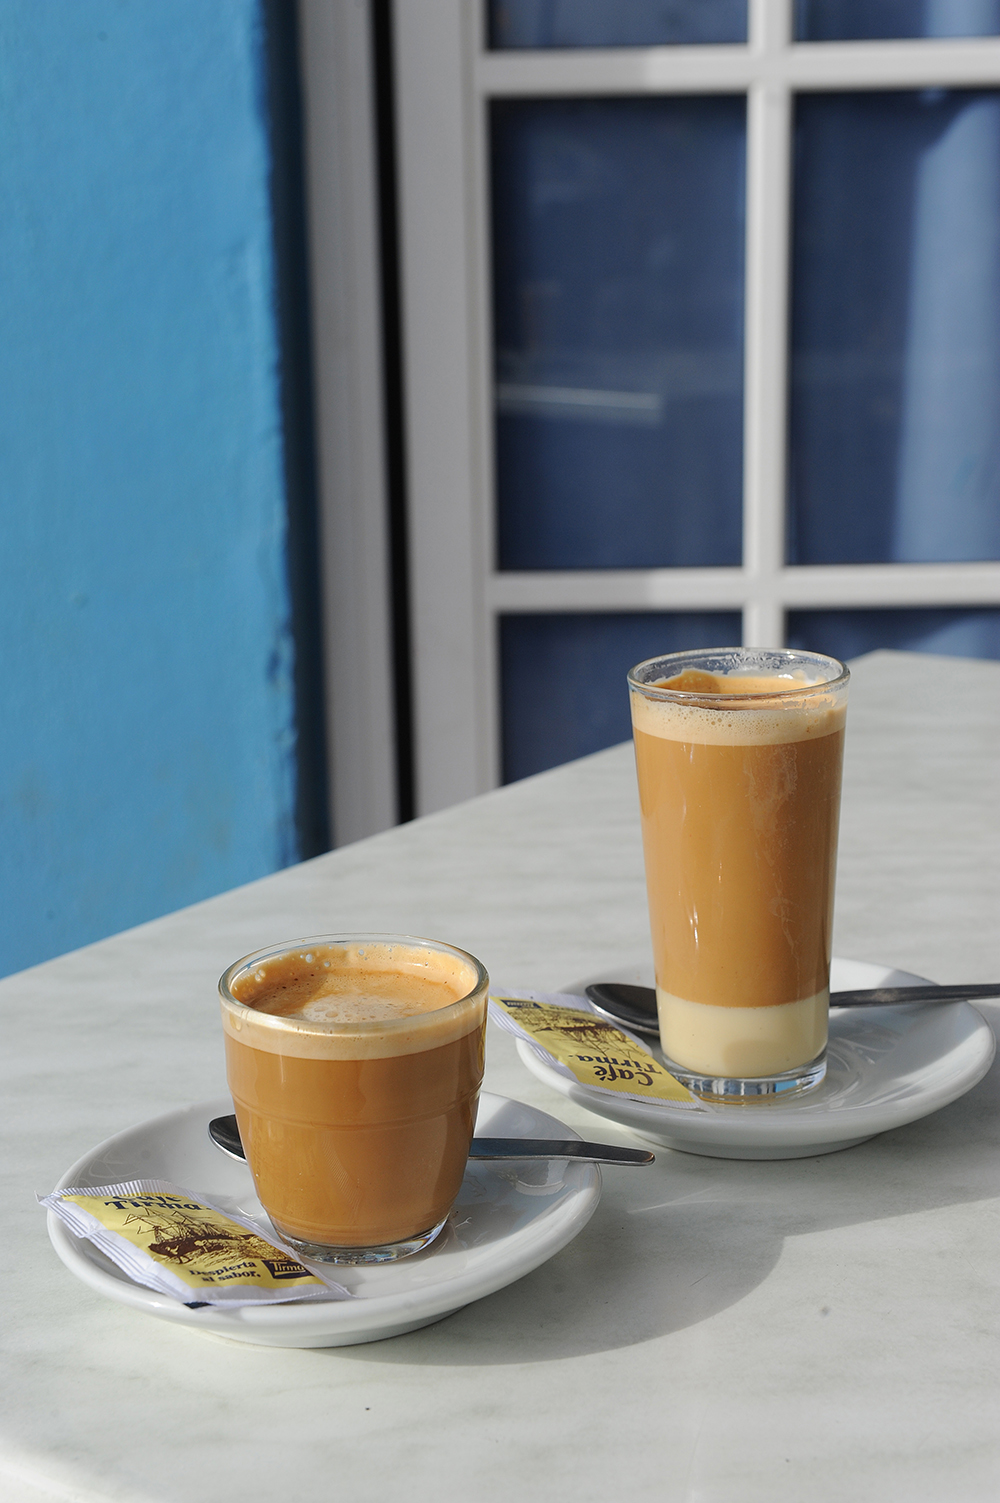 Kahvi, Kanarian saaret